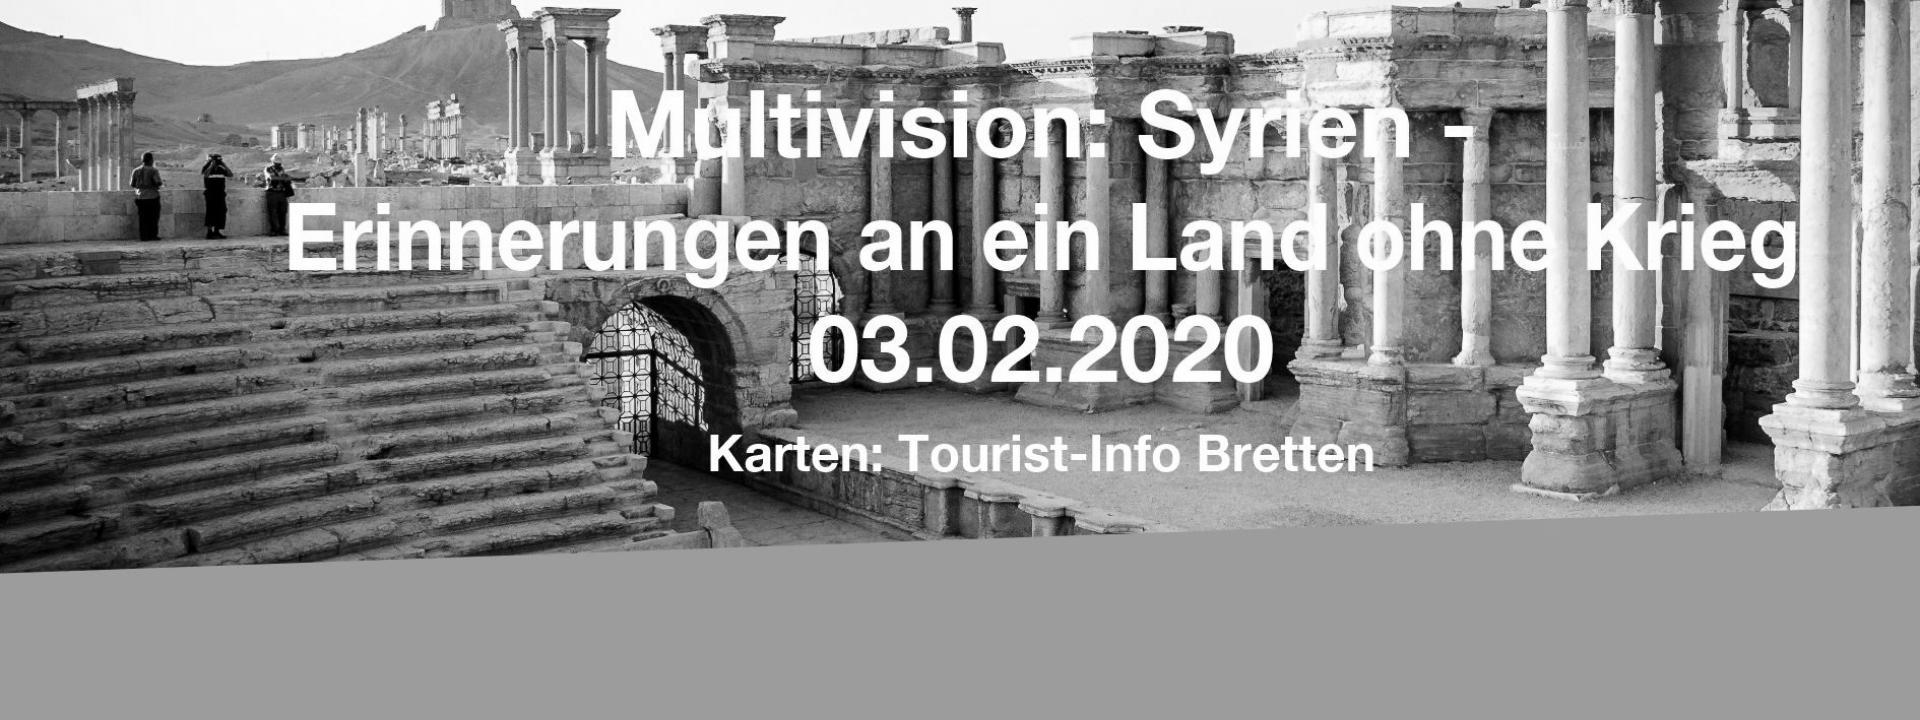 Multivision Syrien